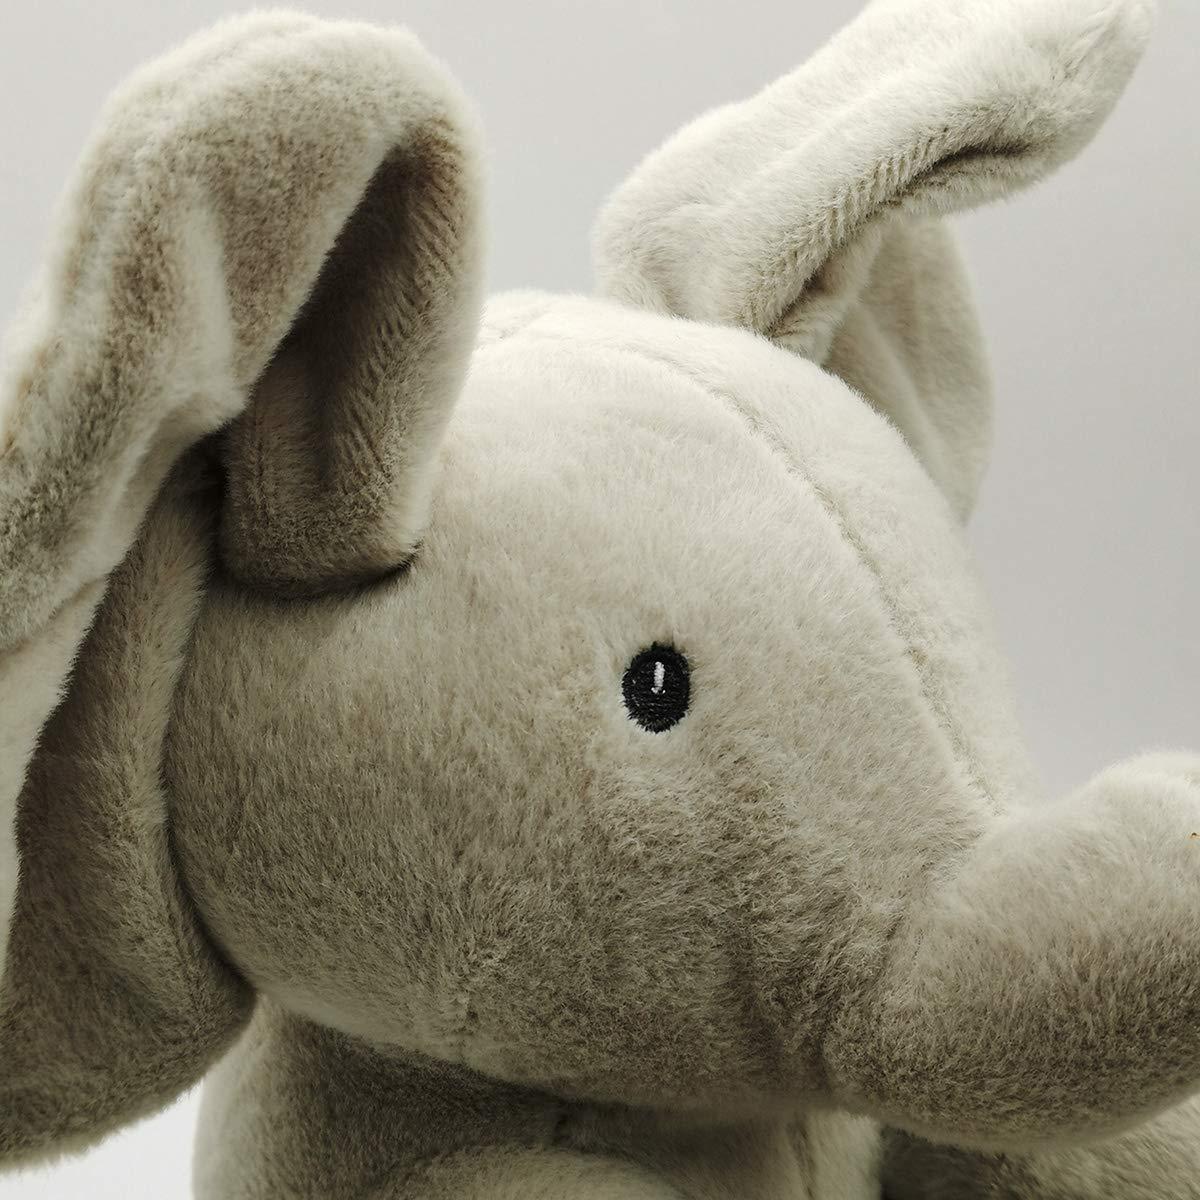 Peek a Boo Teddy Bear Play Hide Seek Elephant Peek-a-Boo Interactive Sing and Play Plush Toy Kids Birthday Xmas Gift Cute Electric Music Bear Plush Toy Bear